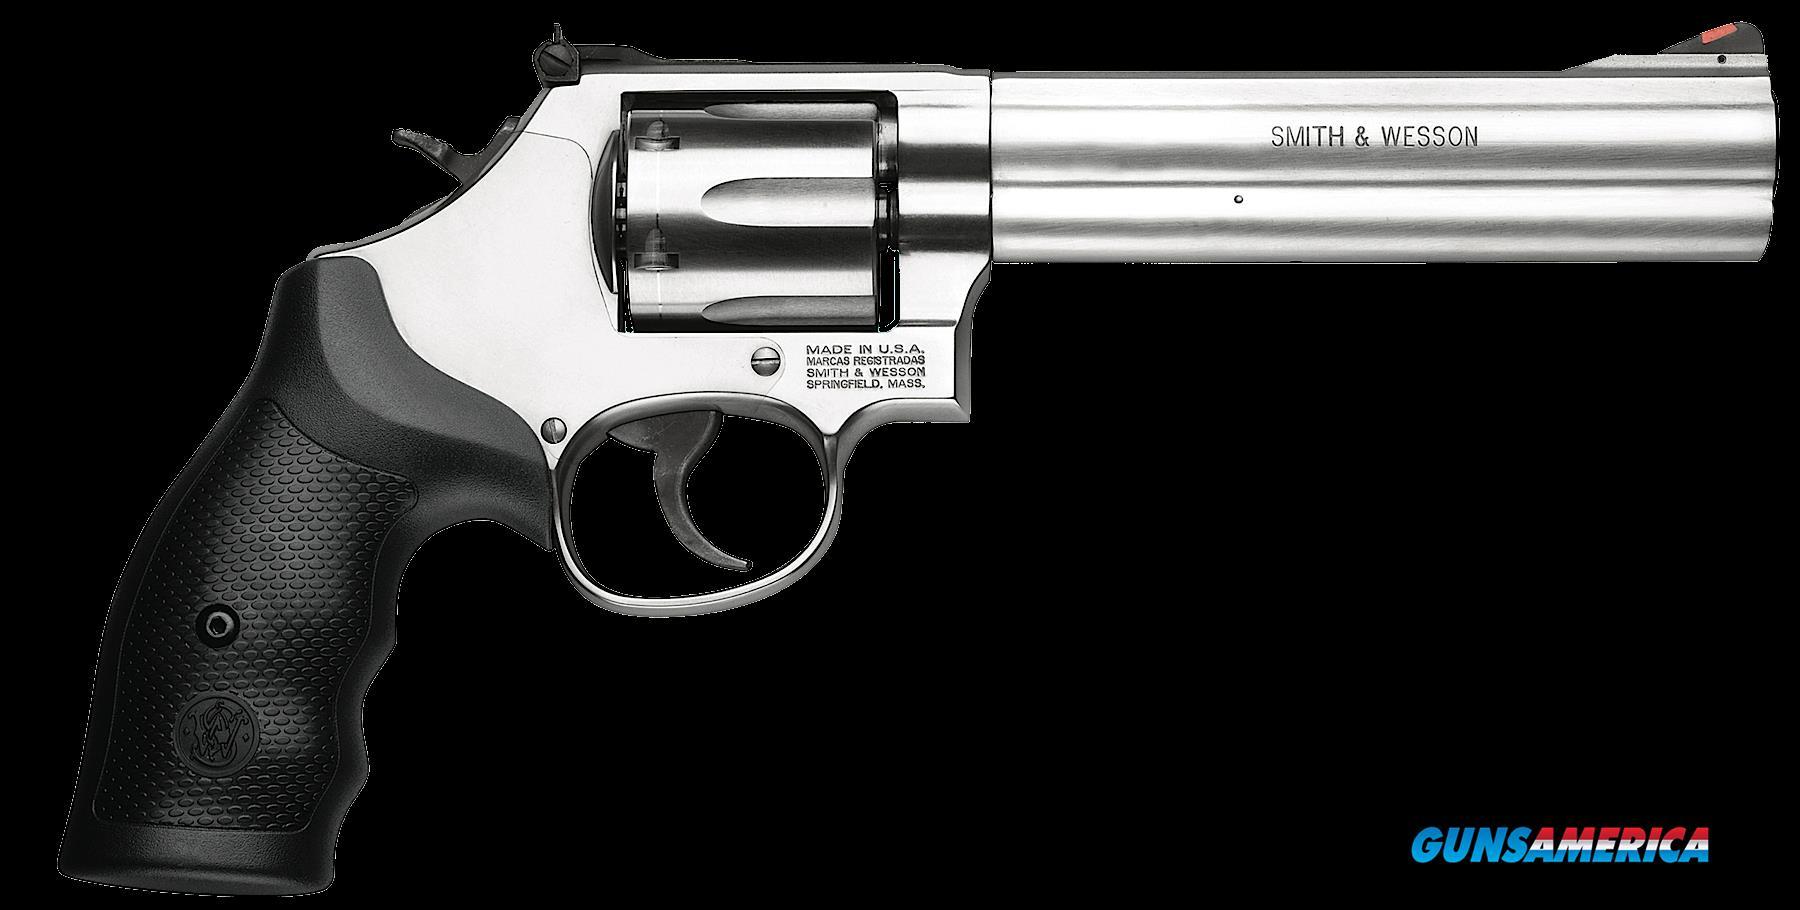 Smith & Wesson 686, S&w M686      164224 357 6     Wo Rr    Ss  Guns > Pistols > 1911 Pistol Copies (non-Colt)